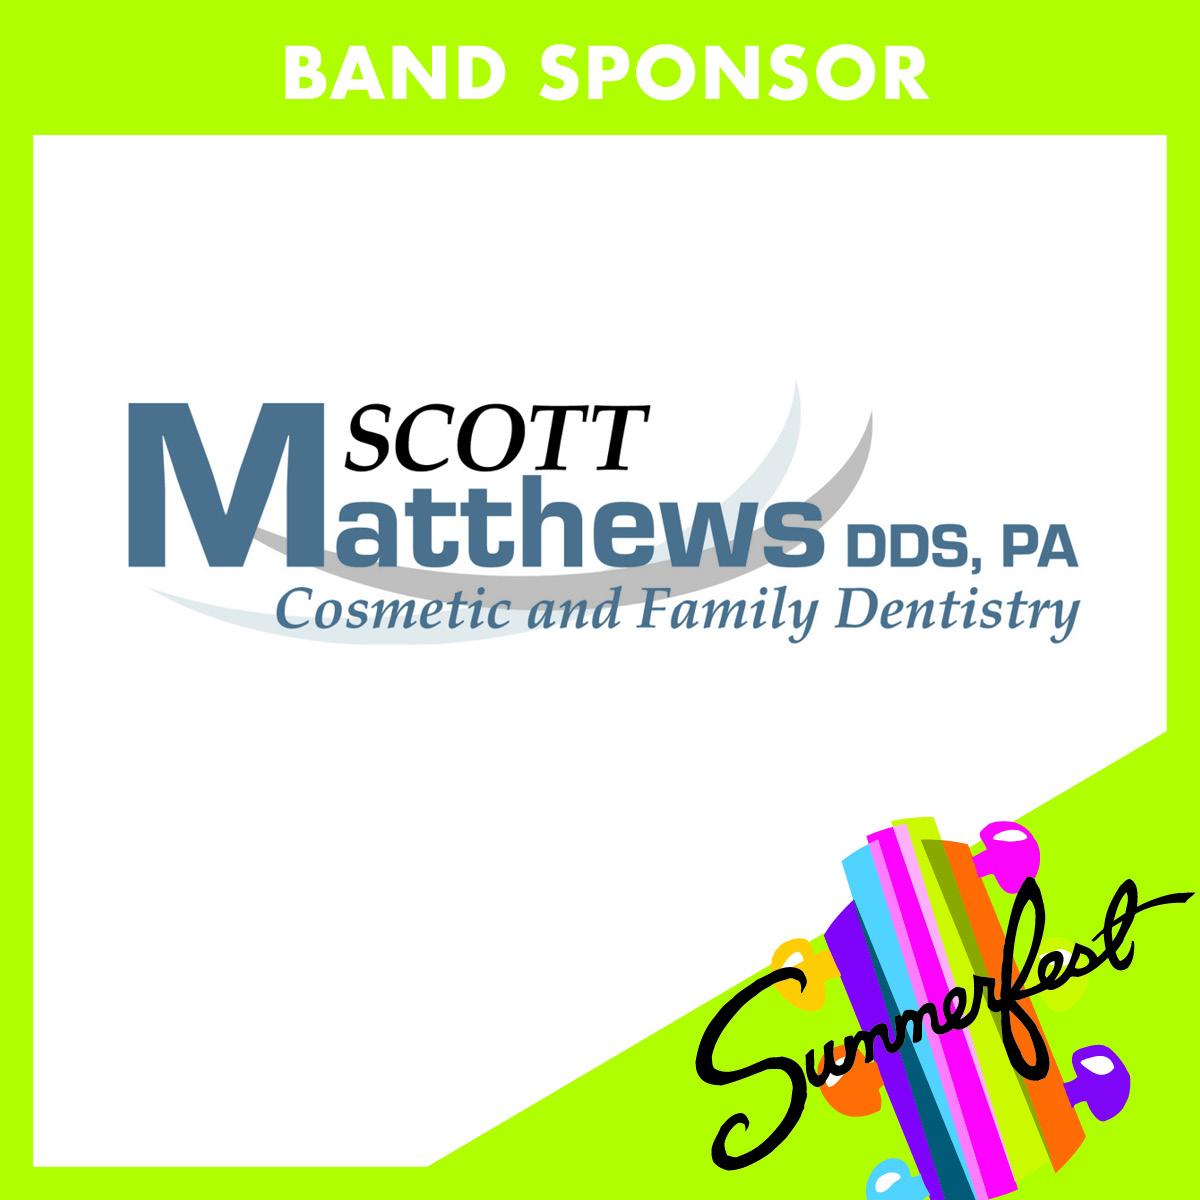 Scott Matthews, DDS, PA - 306 Darby Ave, Kinston, NC 28501(252) 522-4035